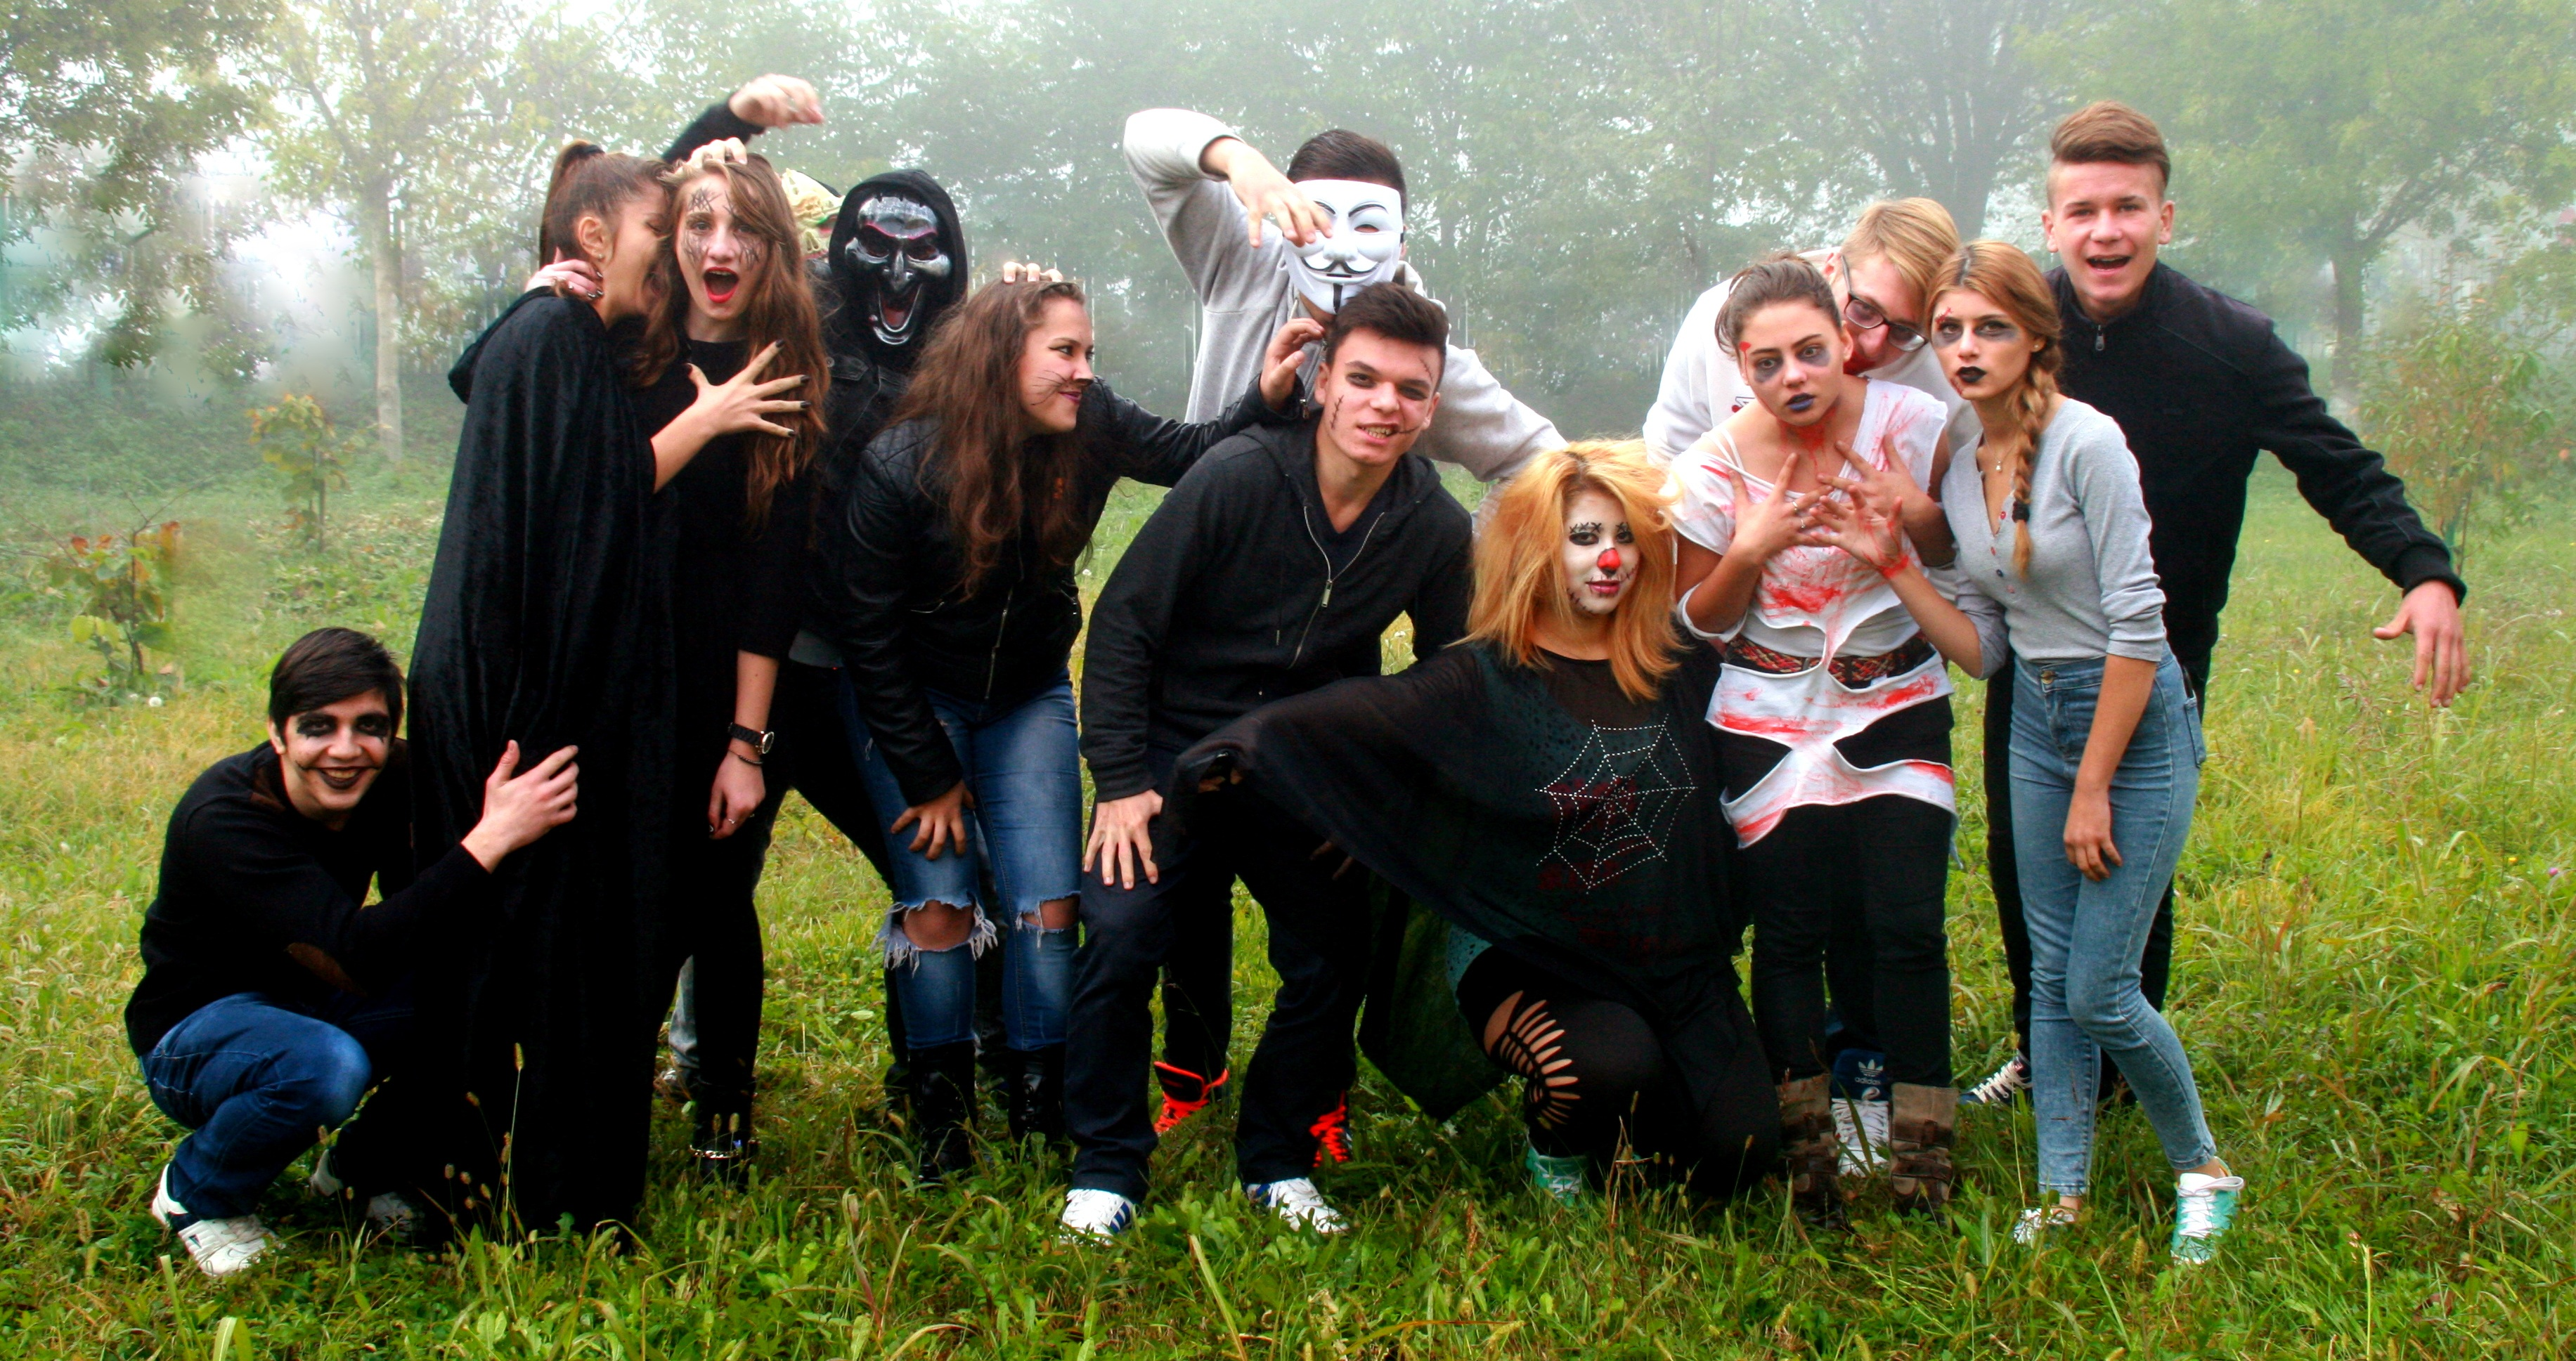 free stock photo of group halloween horror